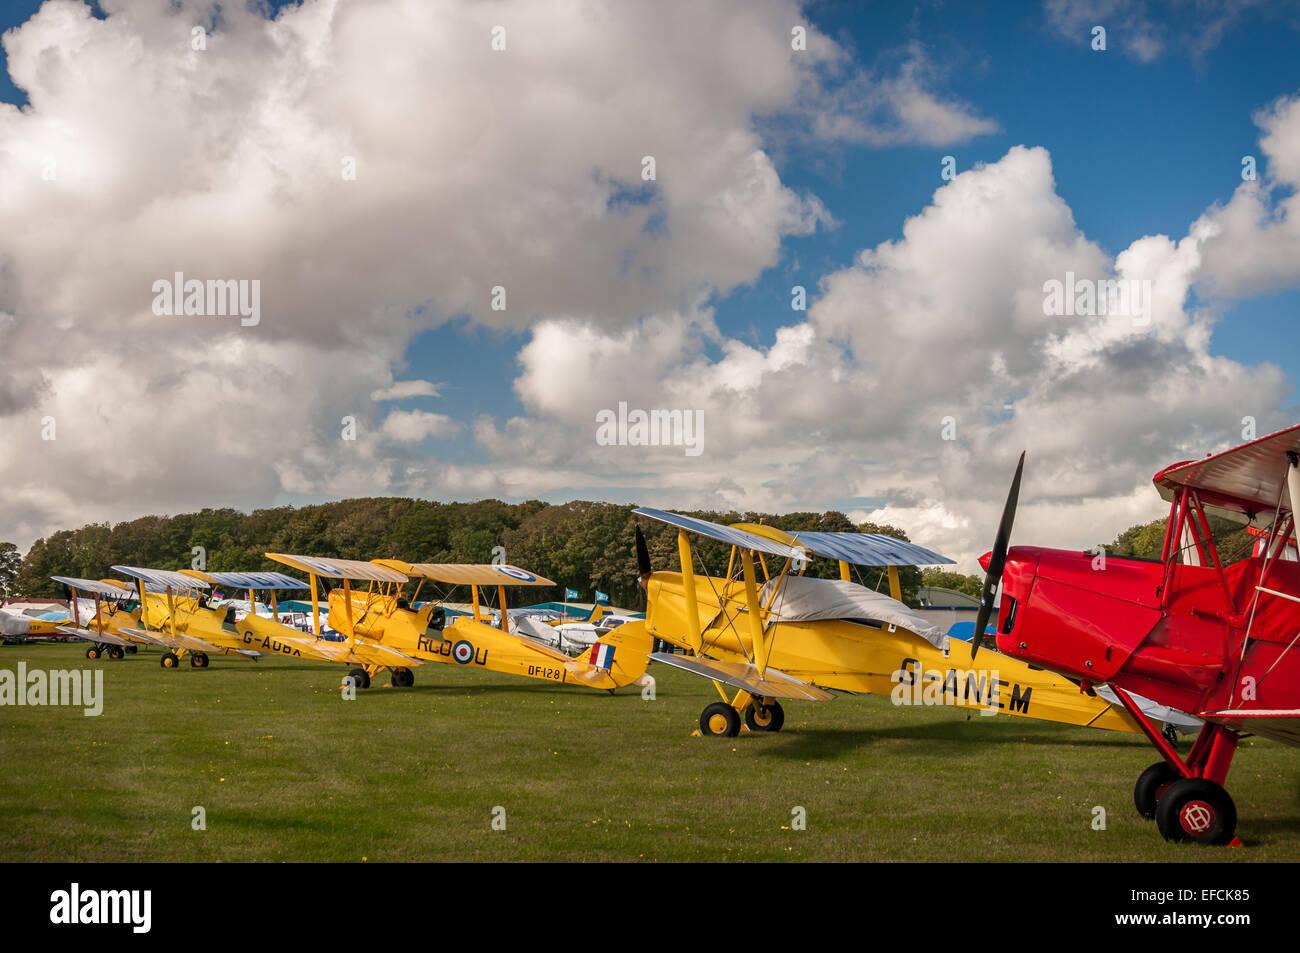 Line of De Havilland Tiger Moths, 1930s biplanes, at Kemble Airshow Stock Photo